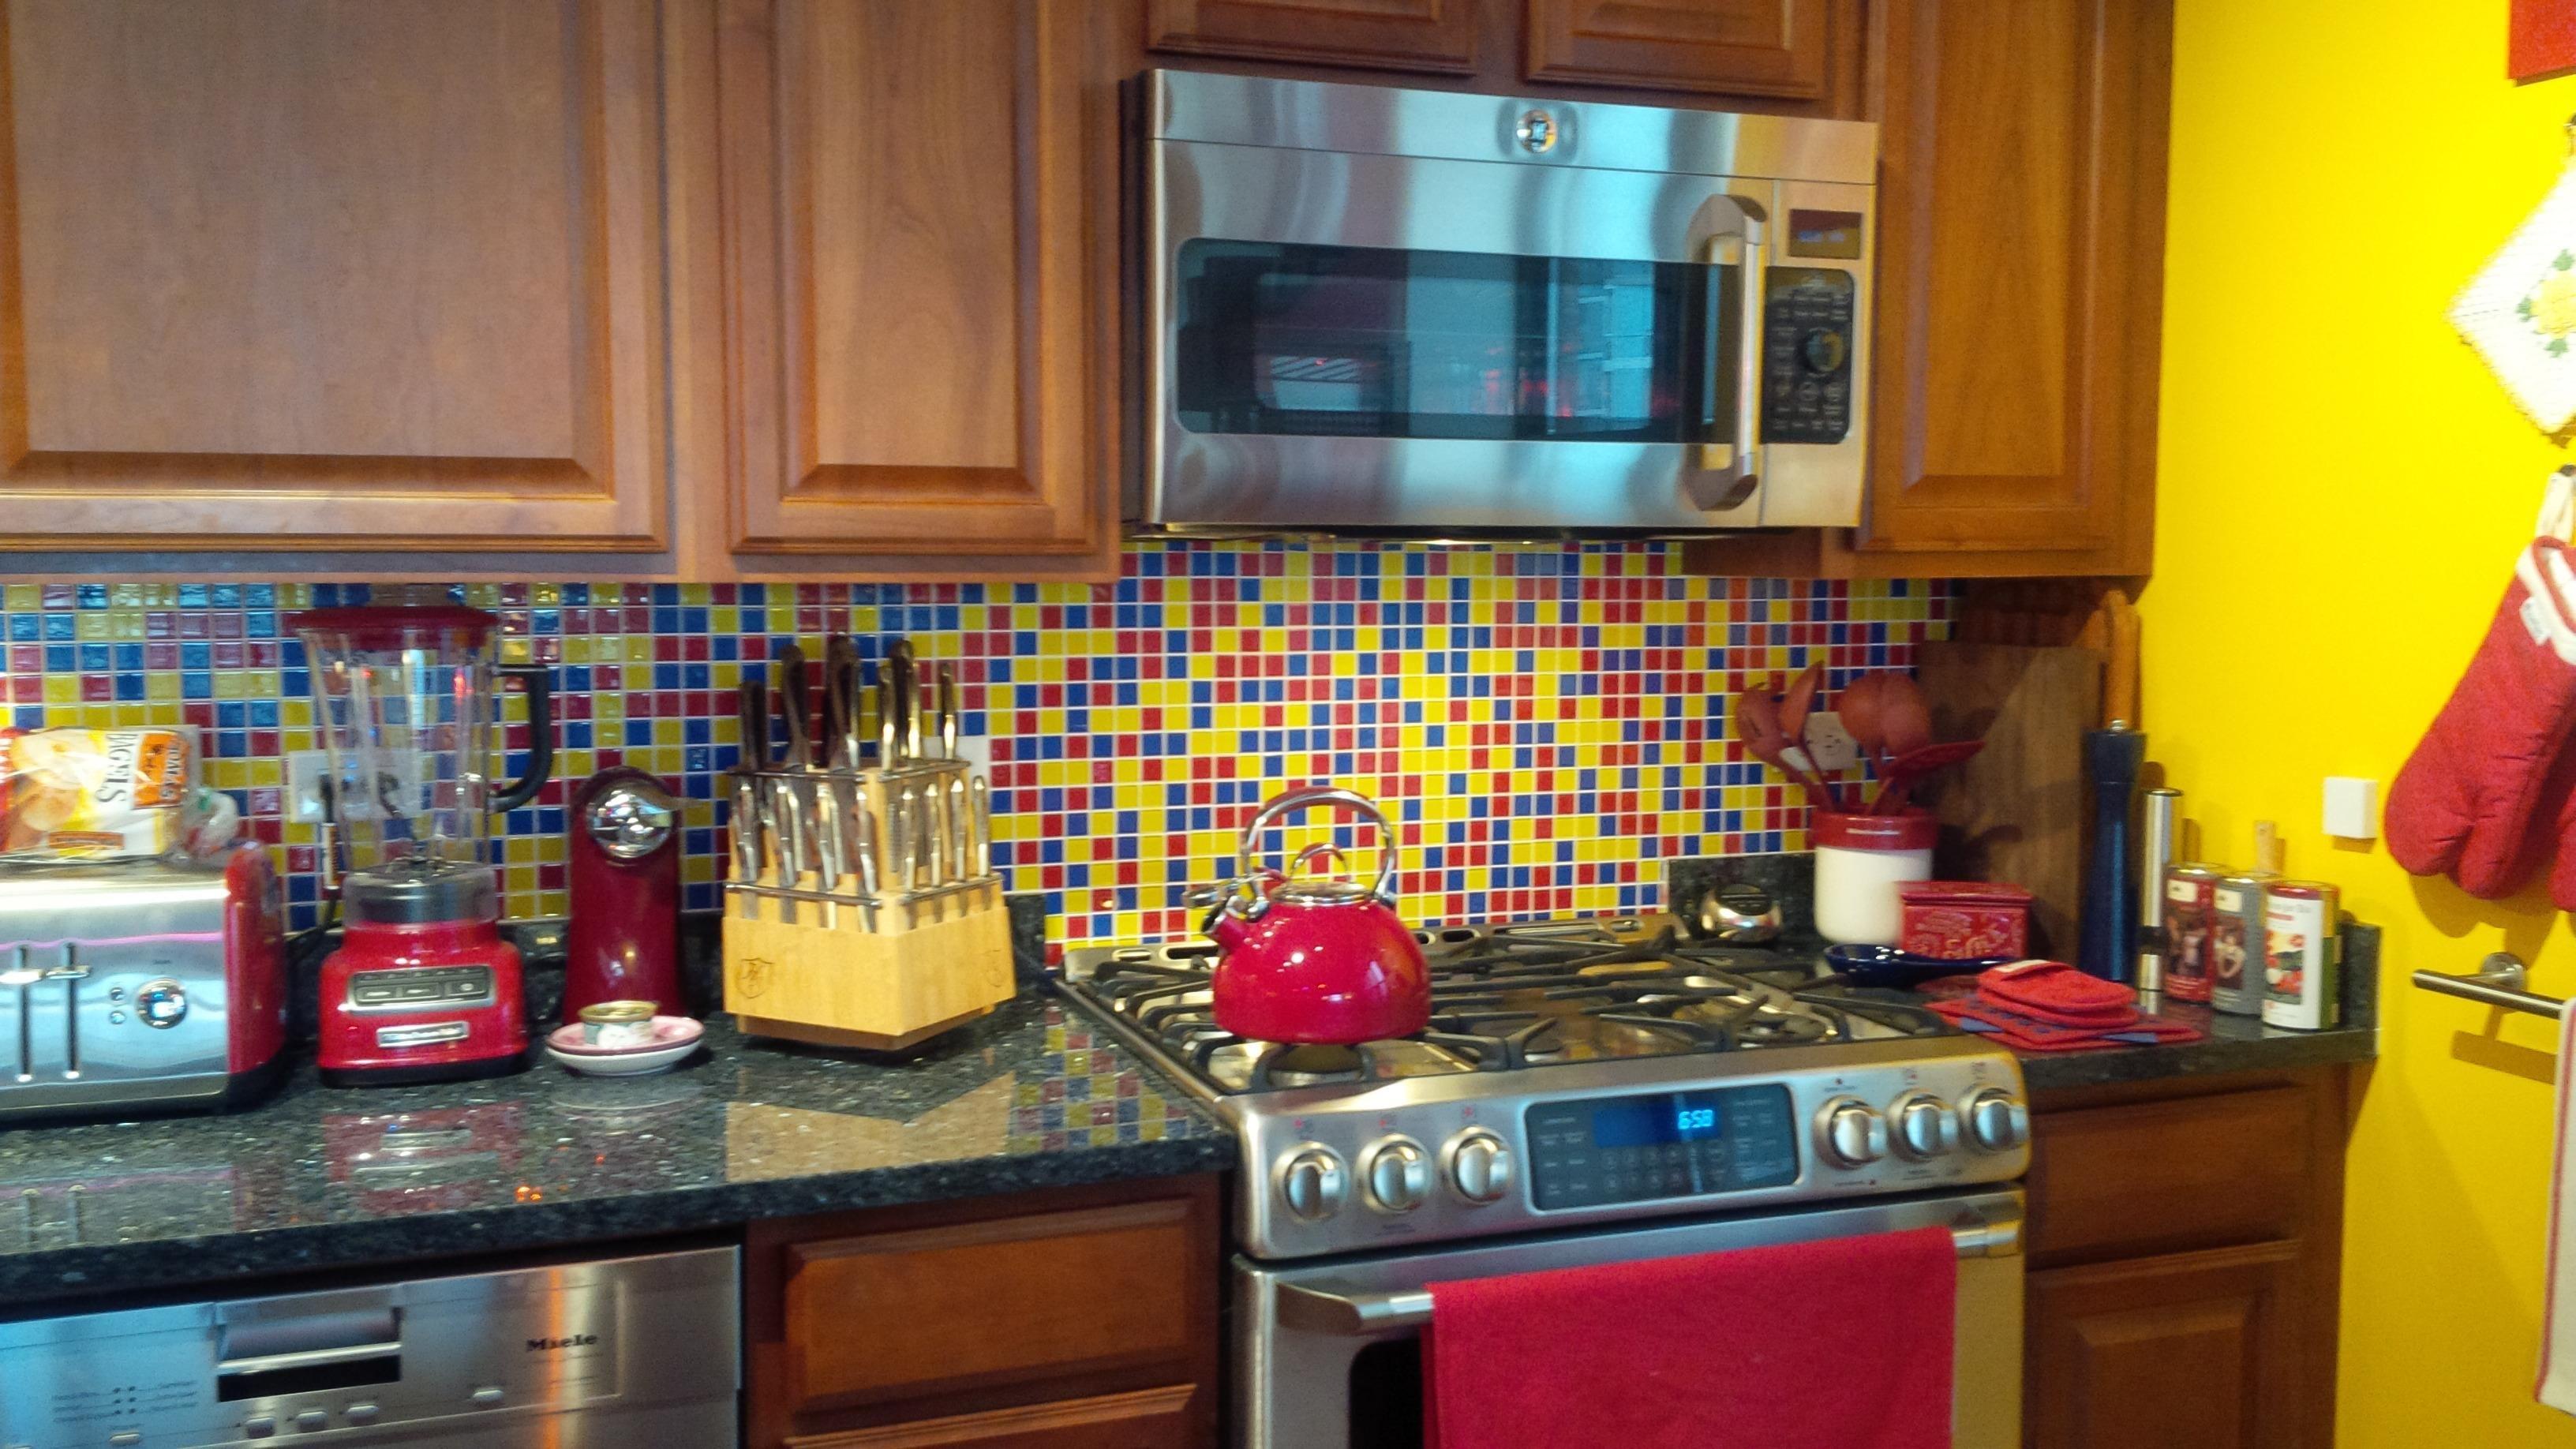 Susan Jablon Mosaics Yellow Kitchen Decor Kitchen Inspiration